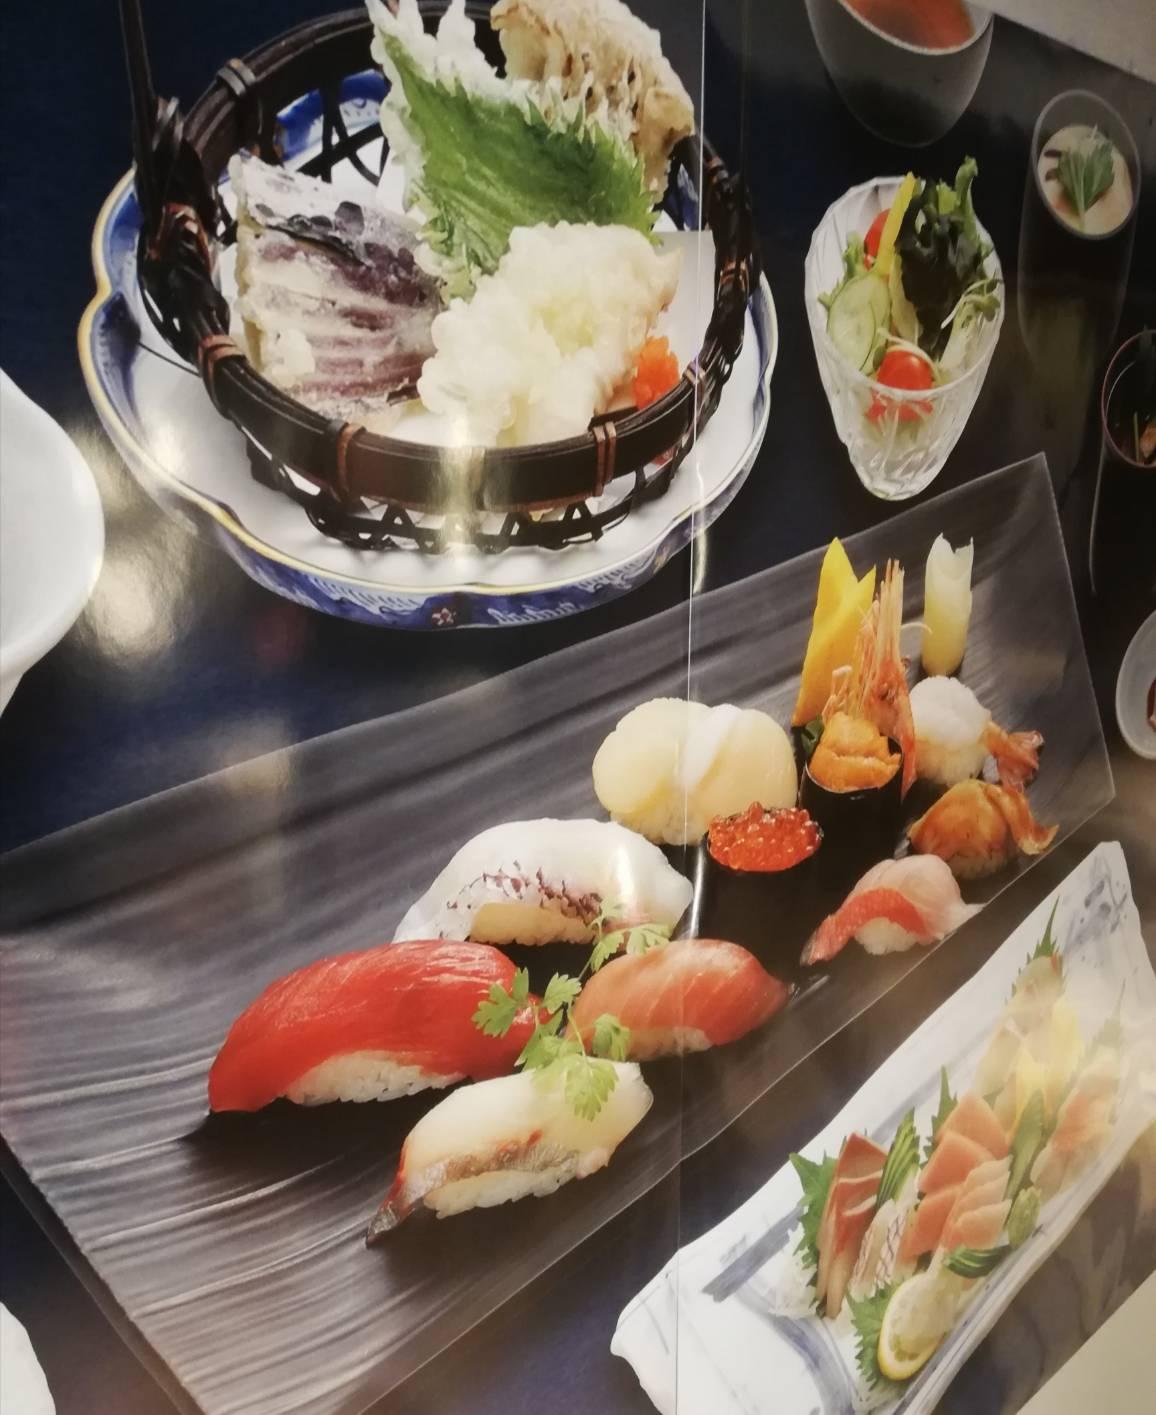 日本橋粋松戸駅ビル店アトレ千葉初京樽回転寿司